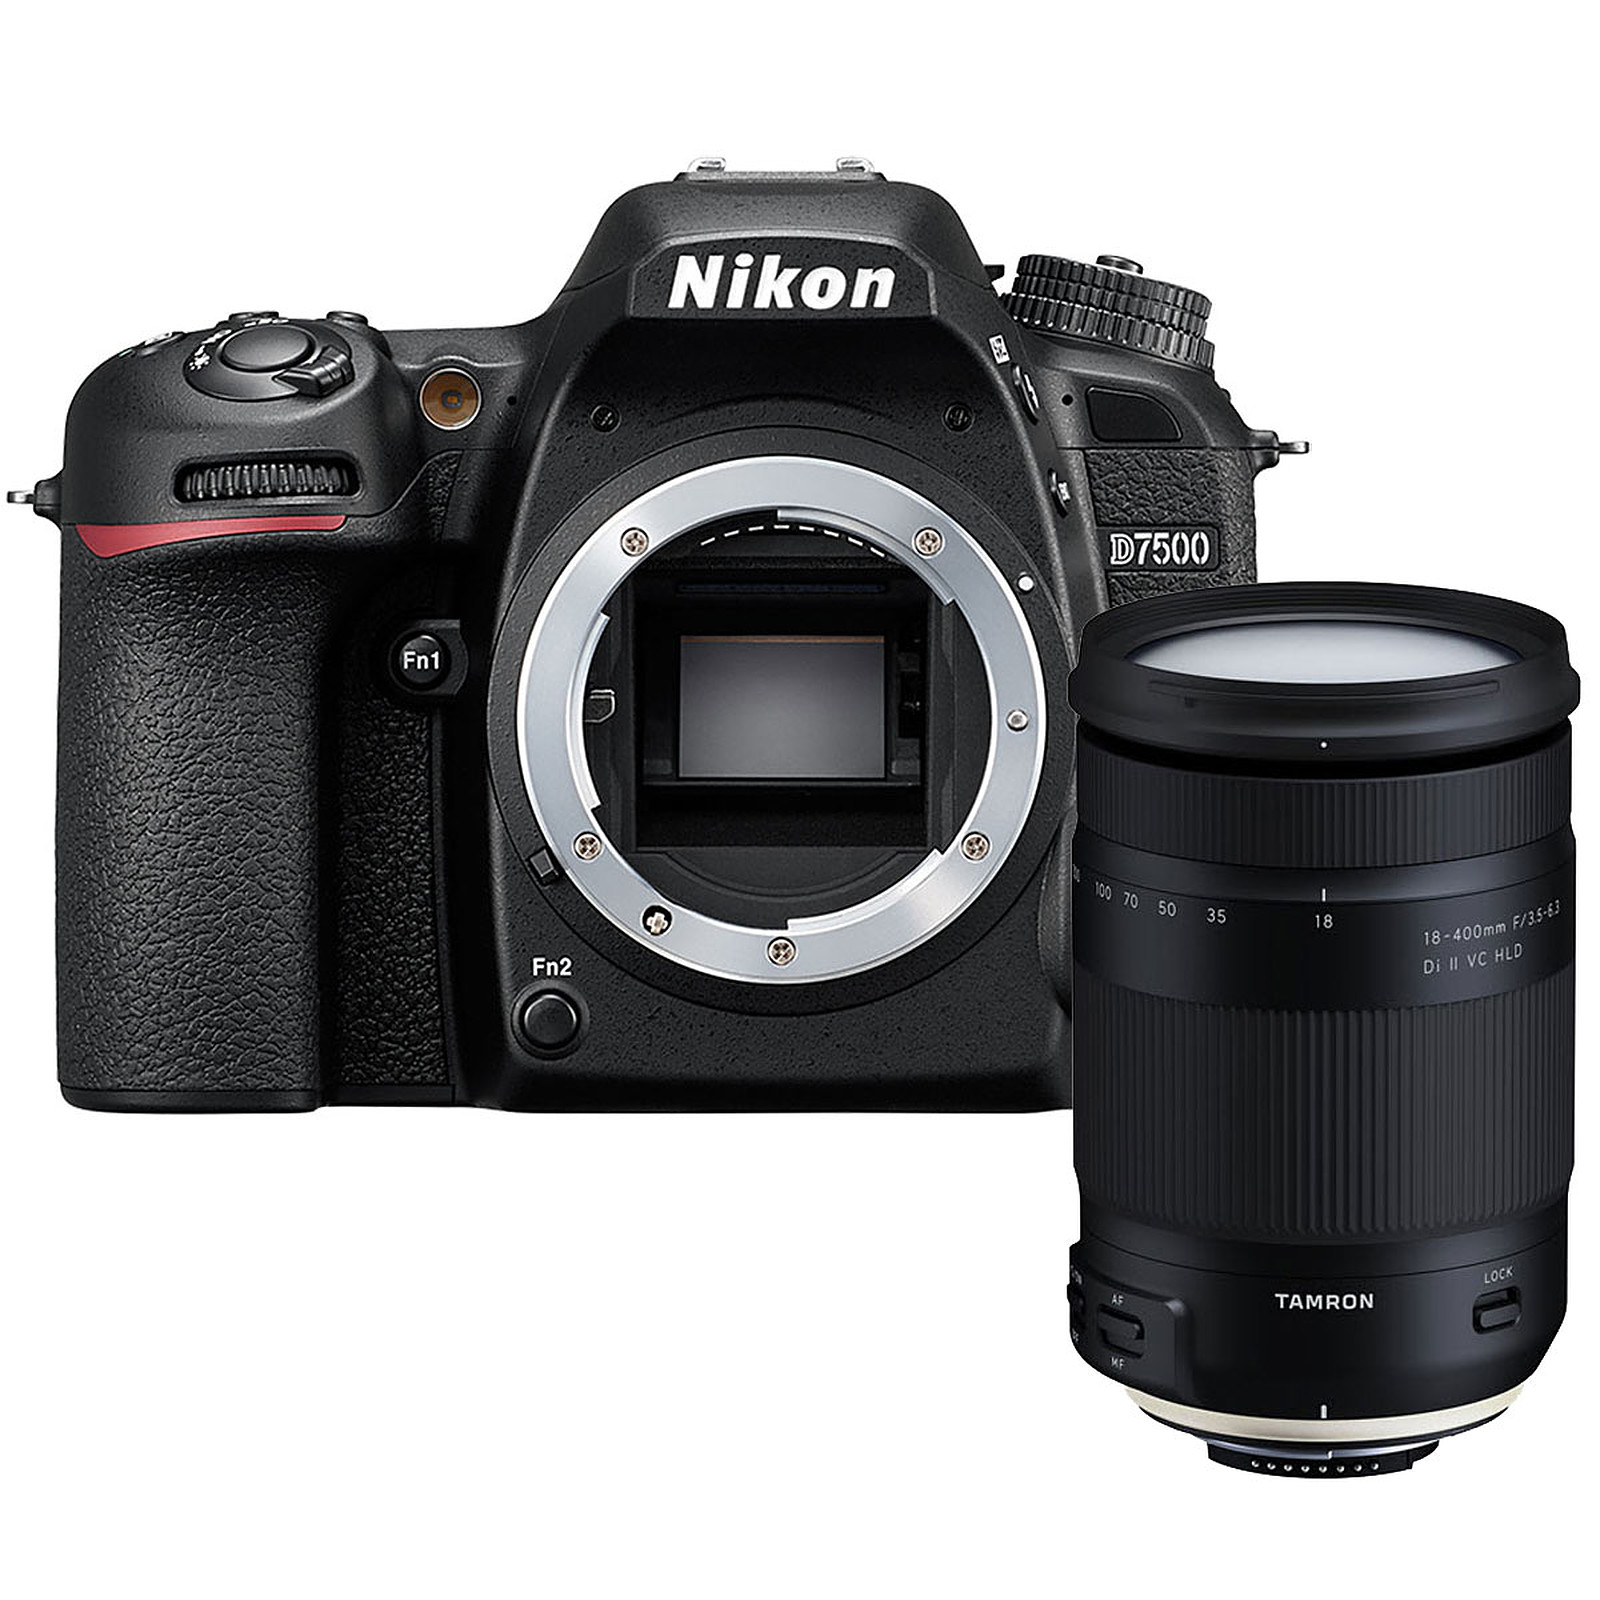 Nikon D7500 (boîtier nu) + Tamron 18-400mm f/3.5-6.3 Di II VC HLD